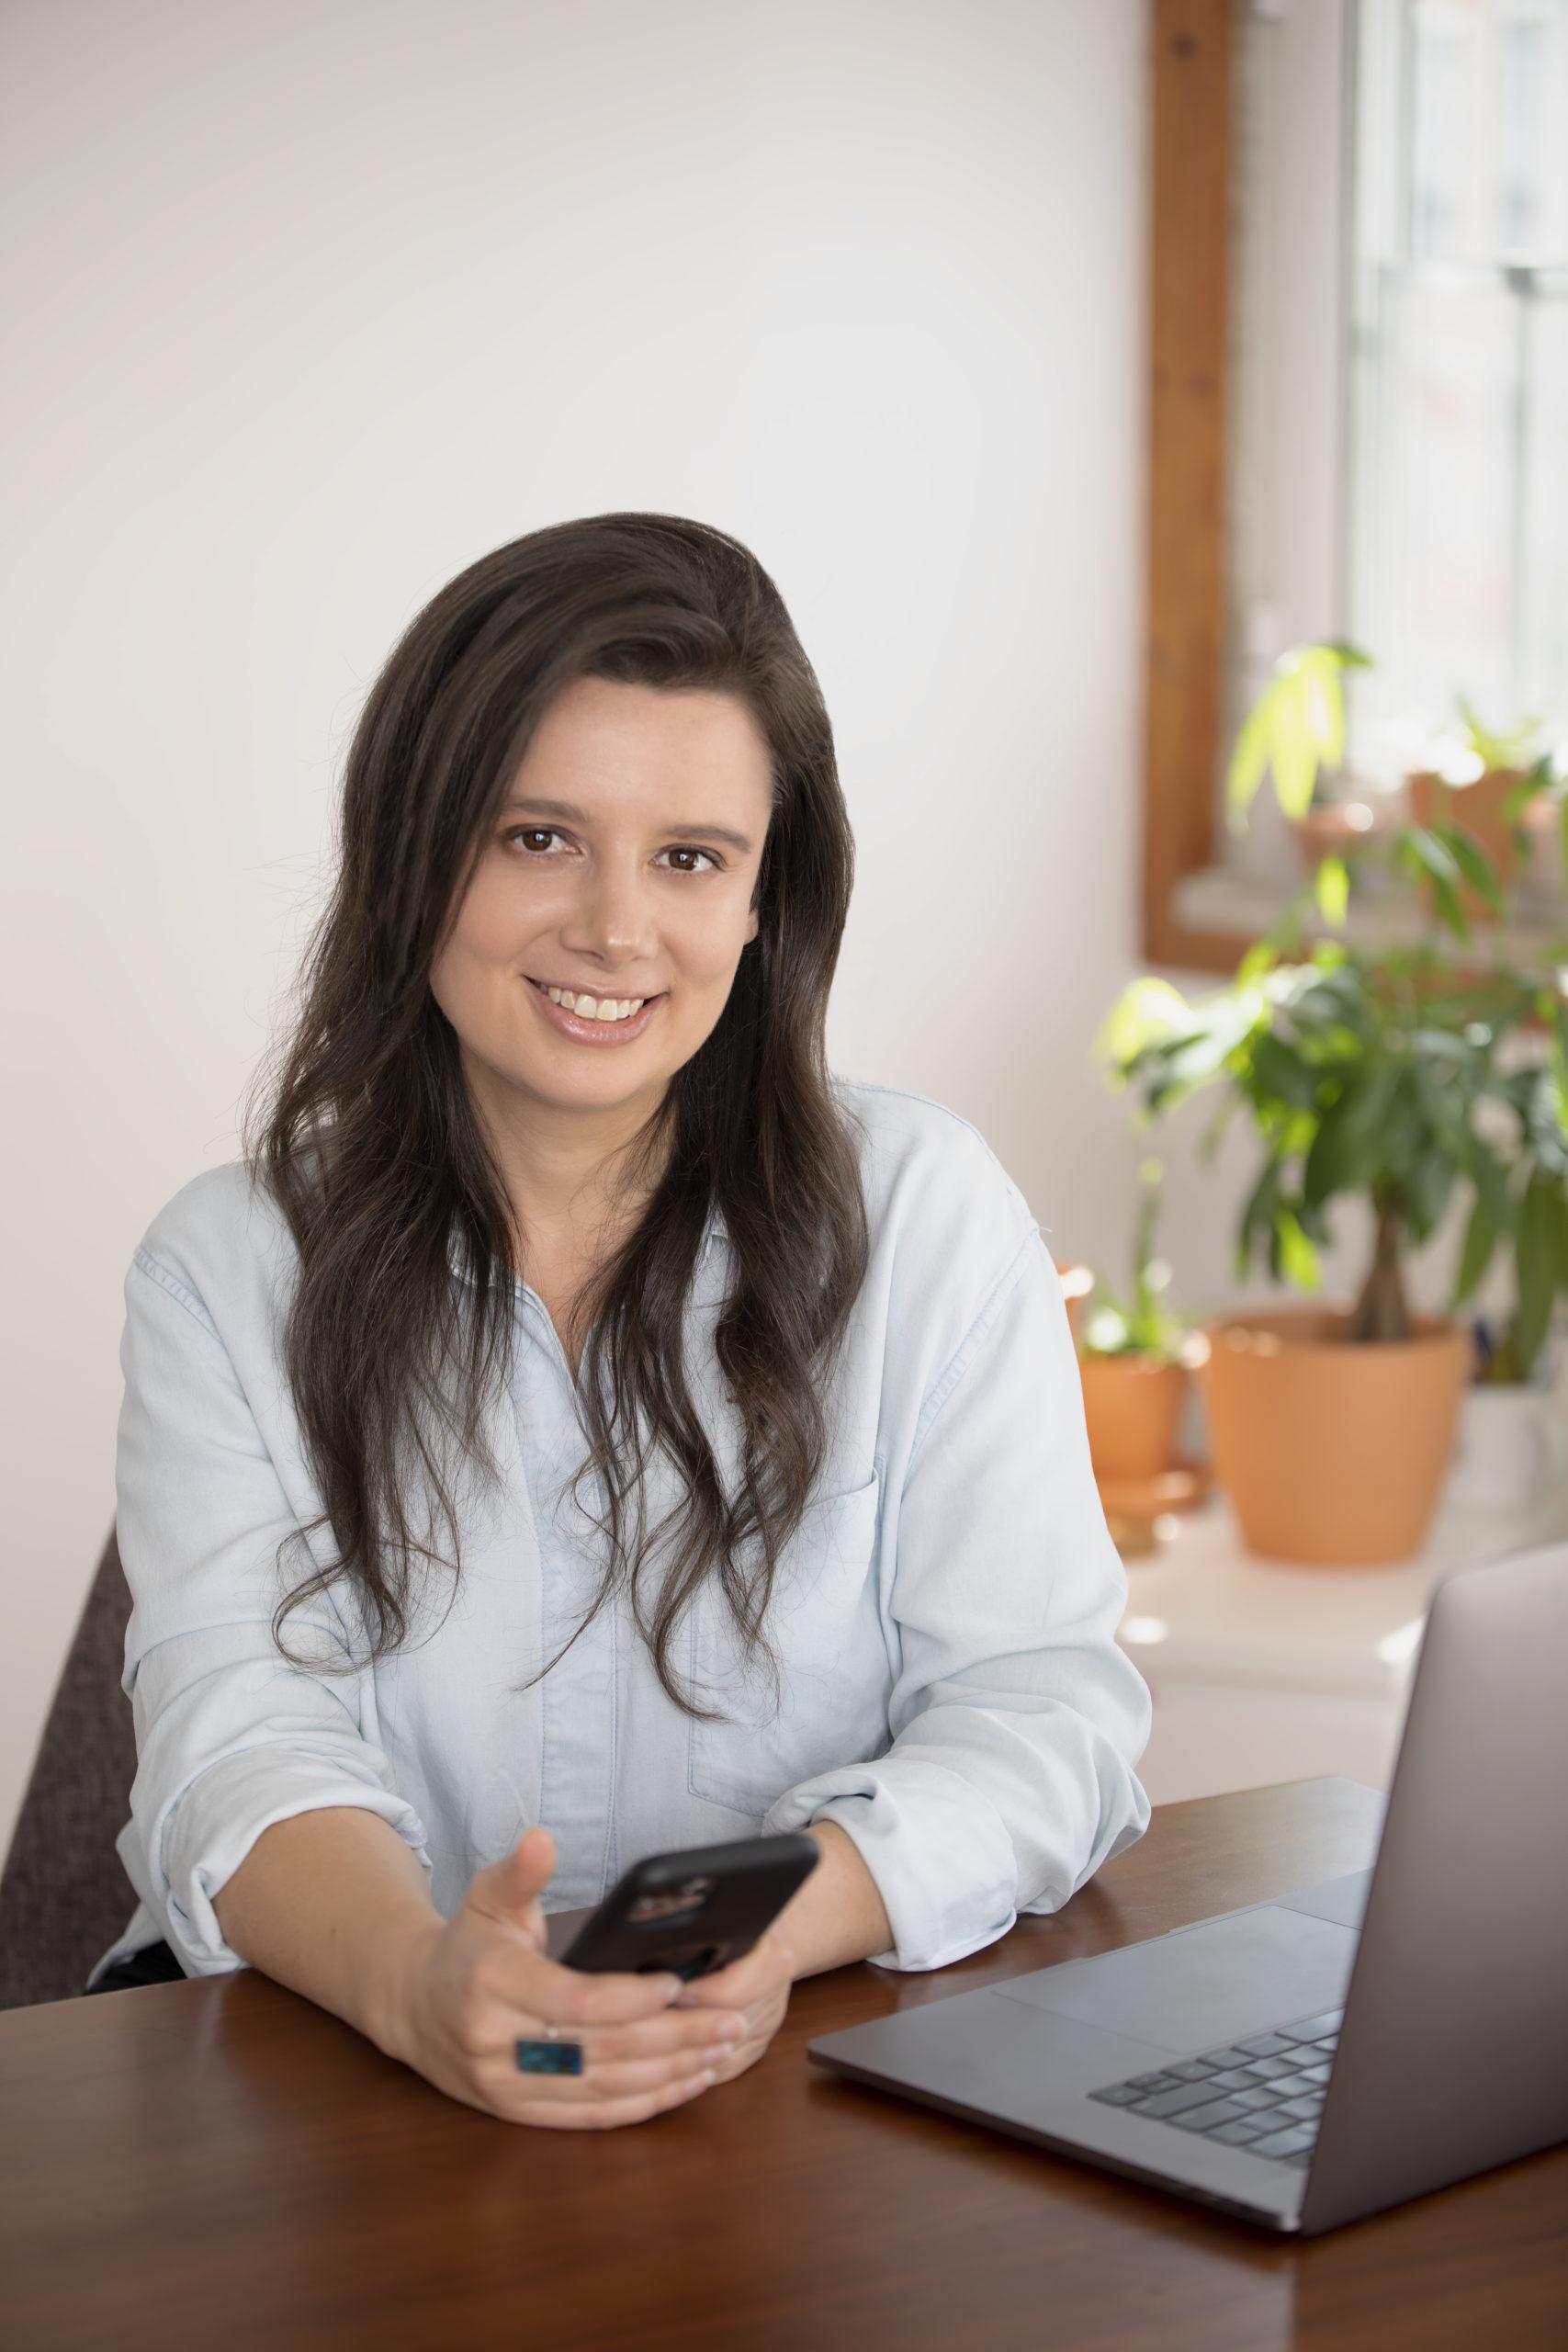 Ep292: Building an International Community with Panion Founder Melanie Aronson